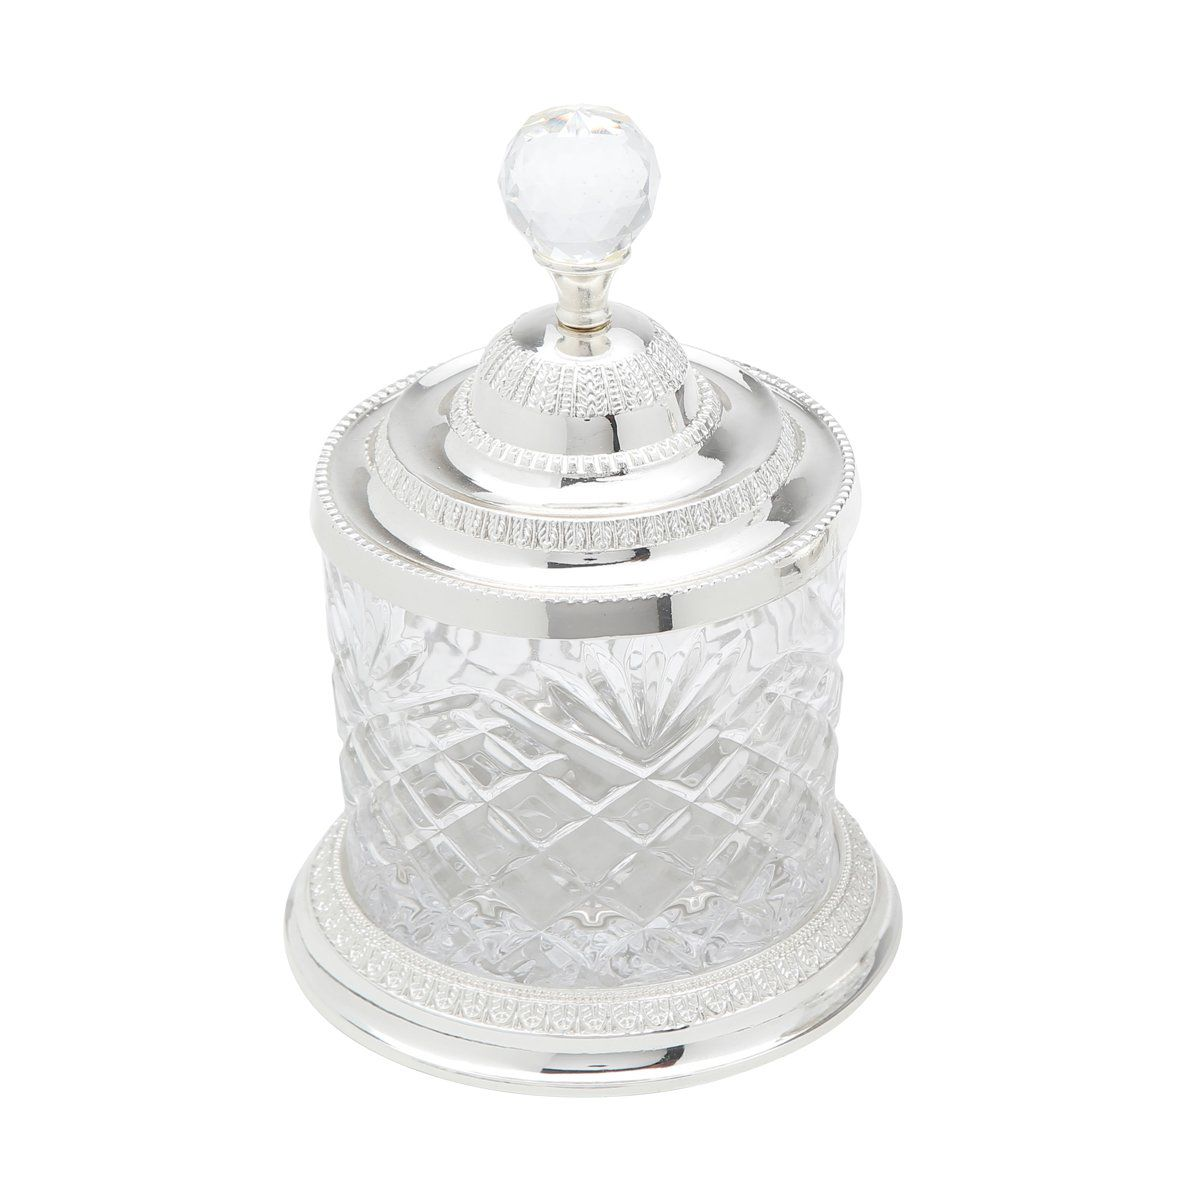 Pote Multiuso 16,5 cm de cristal e zamac prateado com tampa Lyor - L3762